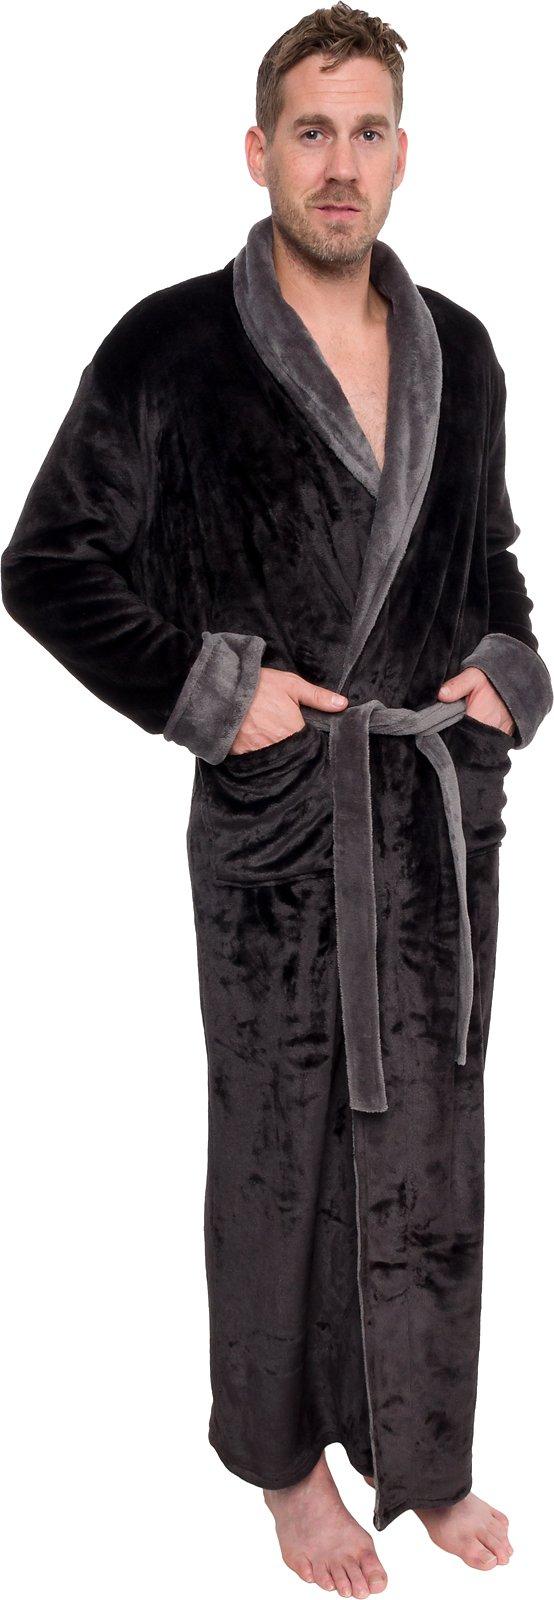 Ross Michaels Mens Long Robe - Full Length Big & Tall Bathrobe (Black & Grey, XXXL)